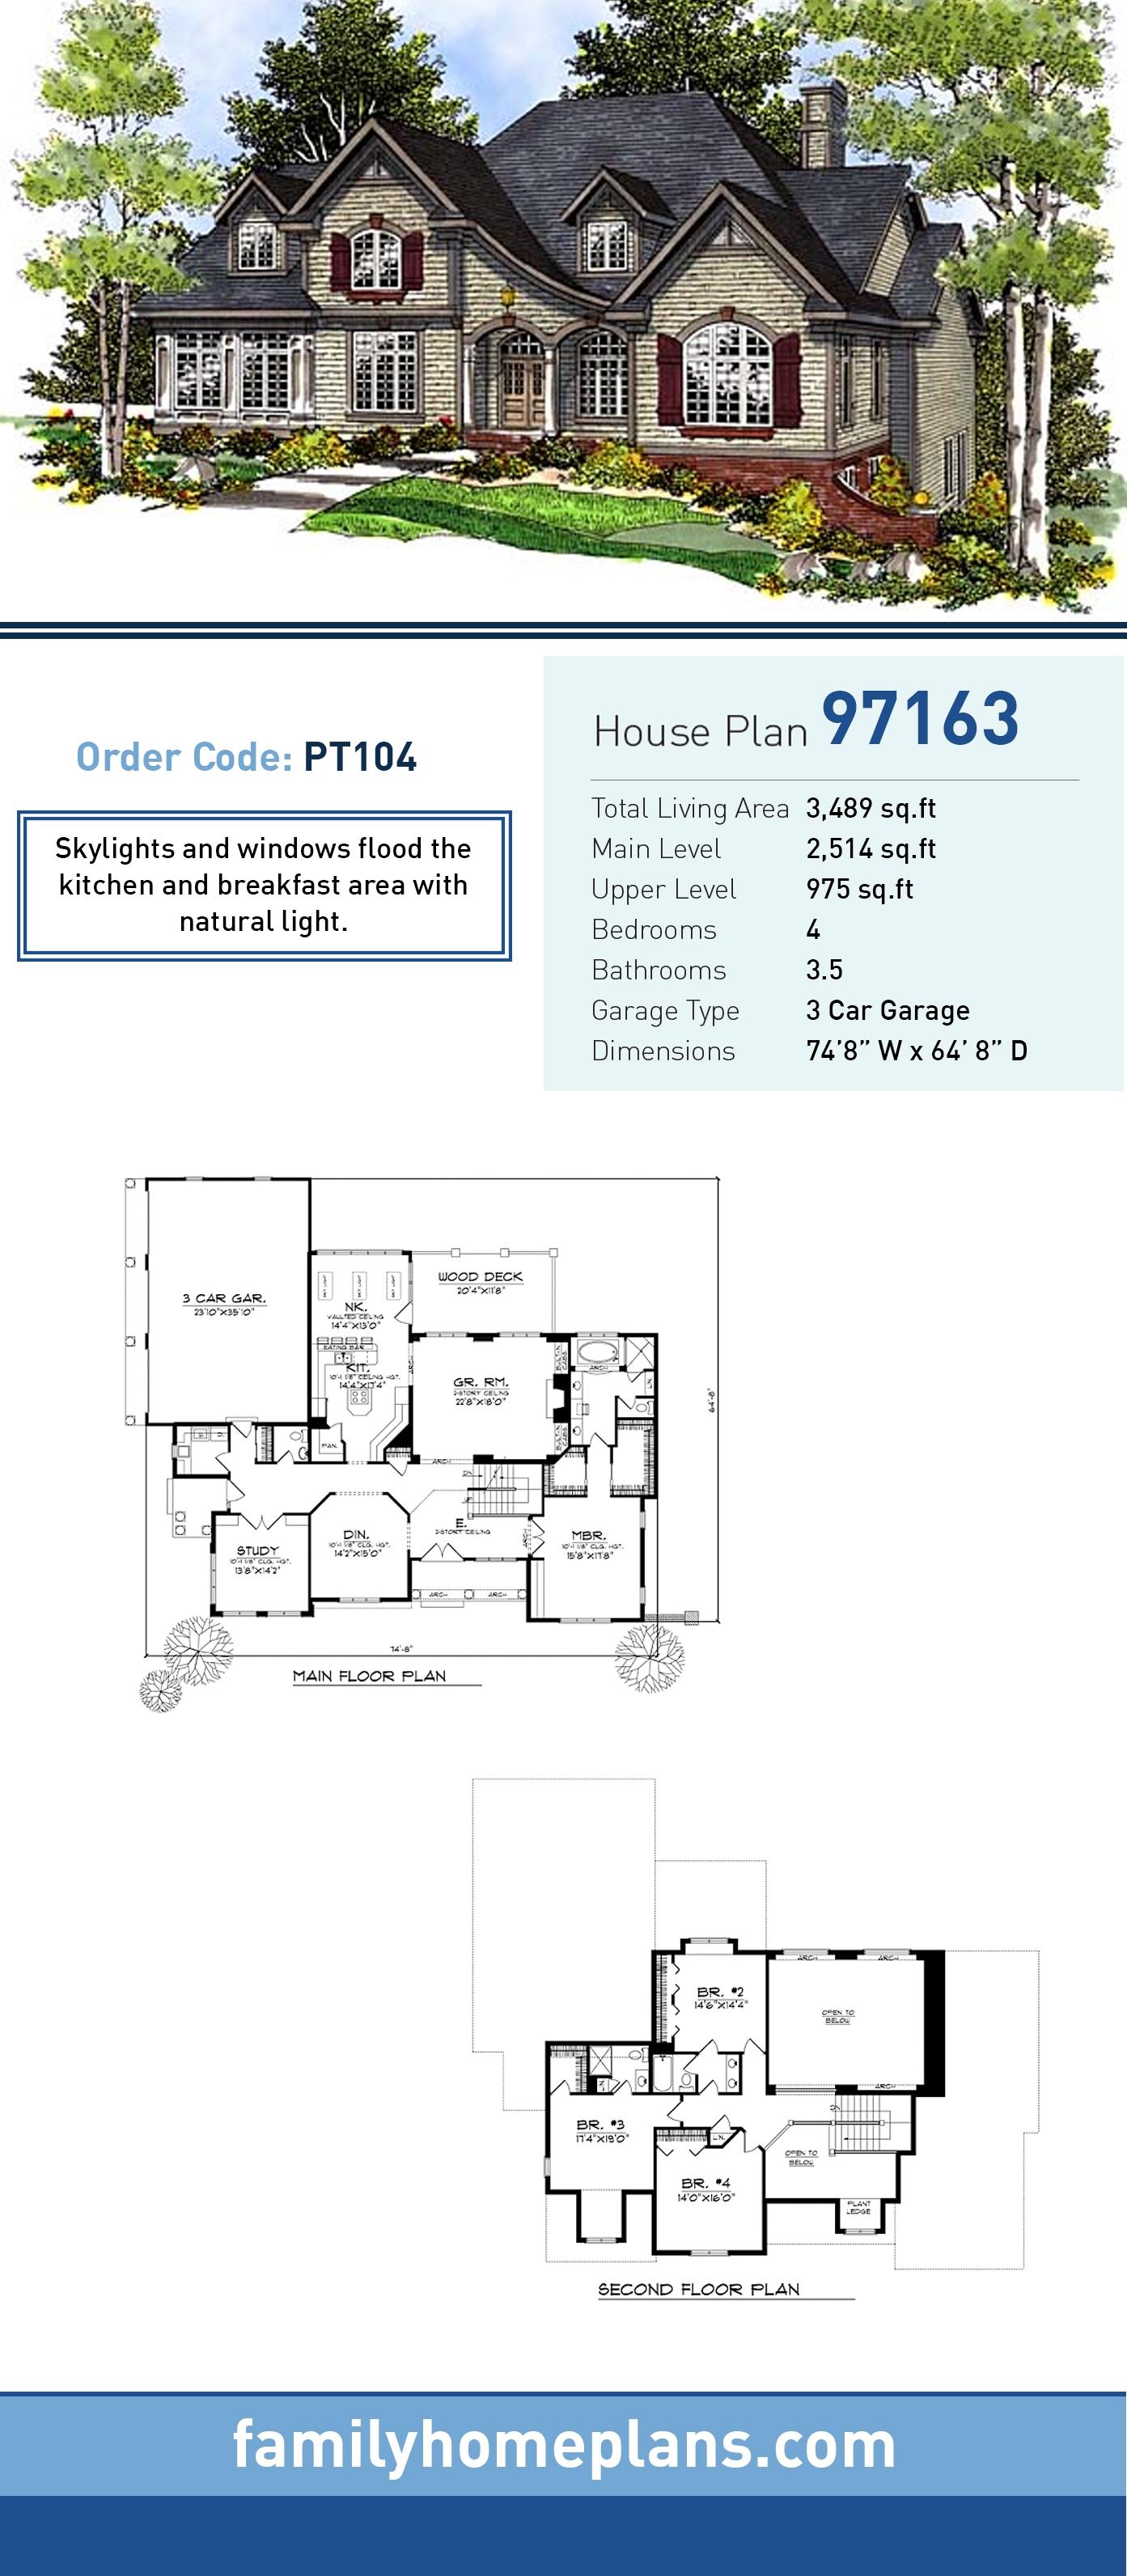 European House Plan 97163 with 4 Beds, 4 Baths, 3 Car Garage